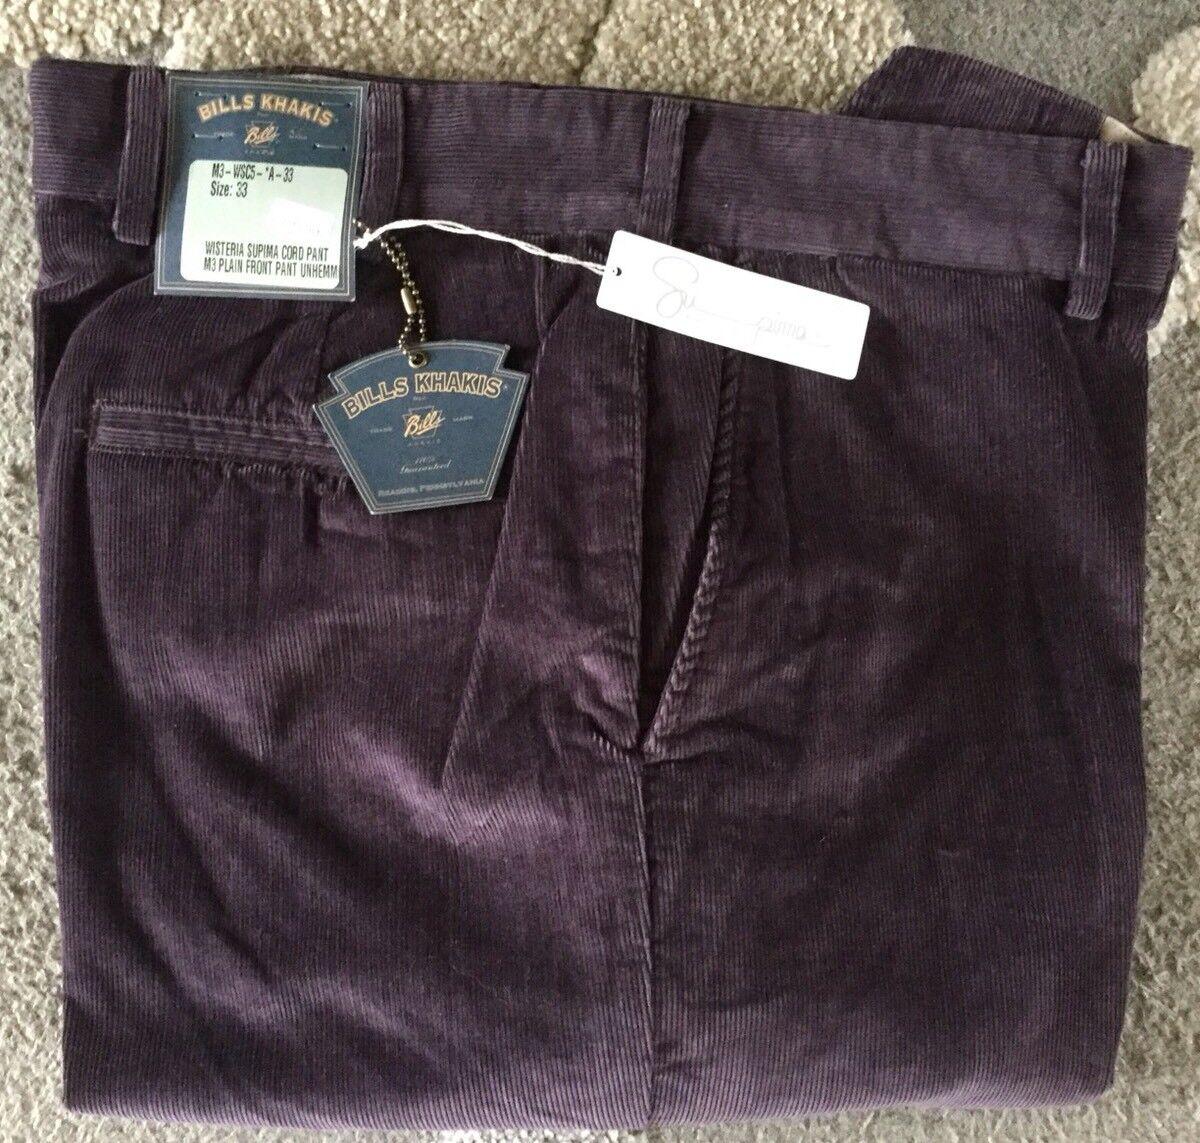 BRAND NEW-Bills khakis M3-WSC5 Size 33 SUPIMA CORDUROY WISTERIA MSRP